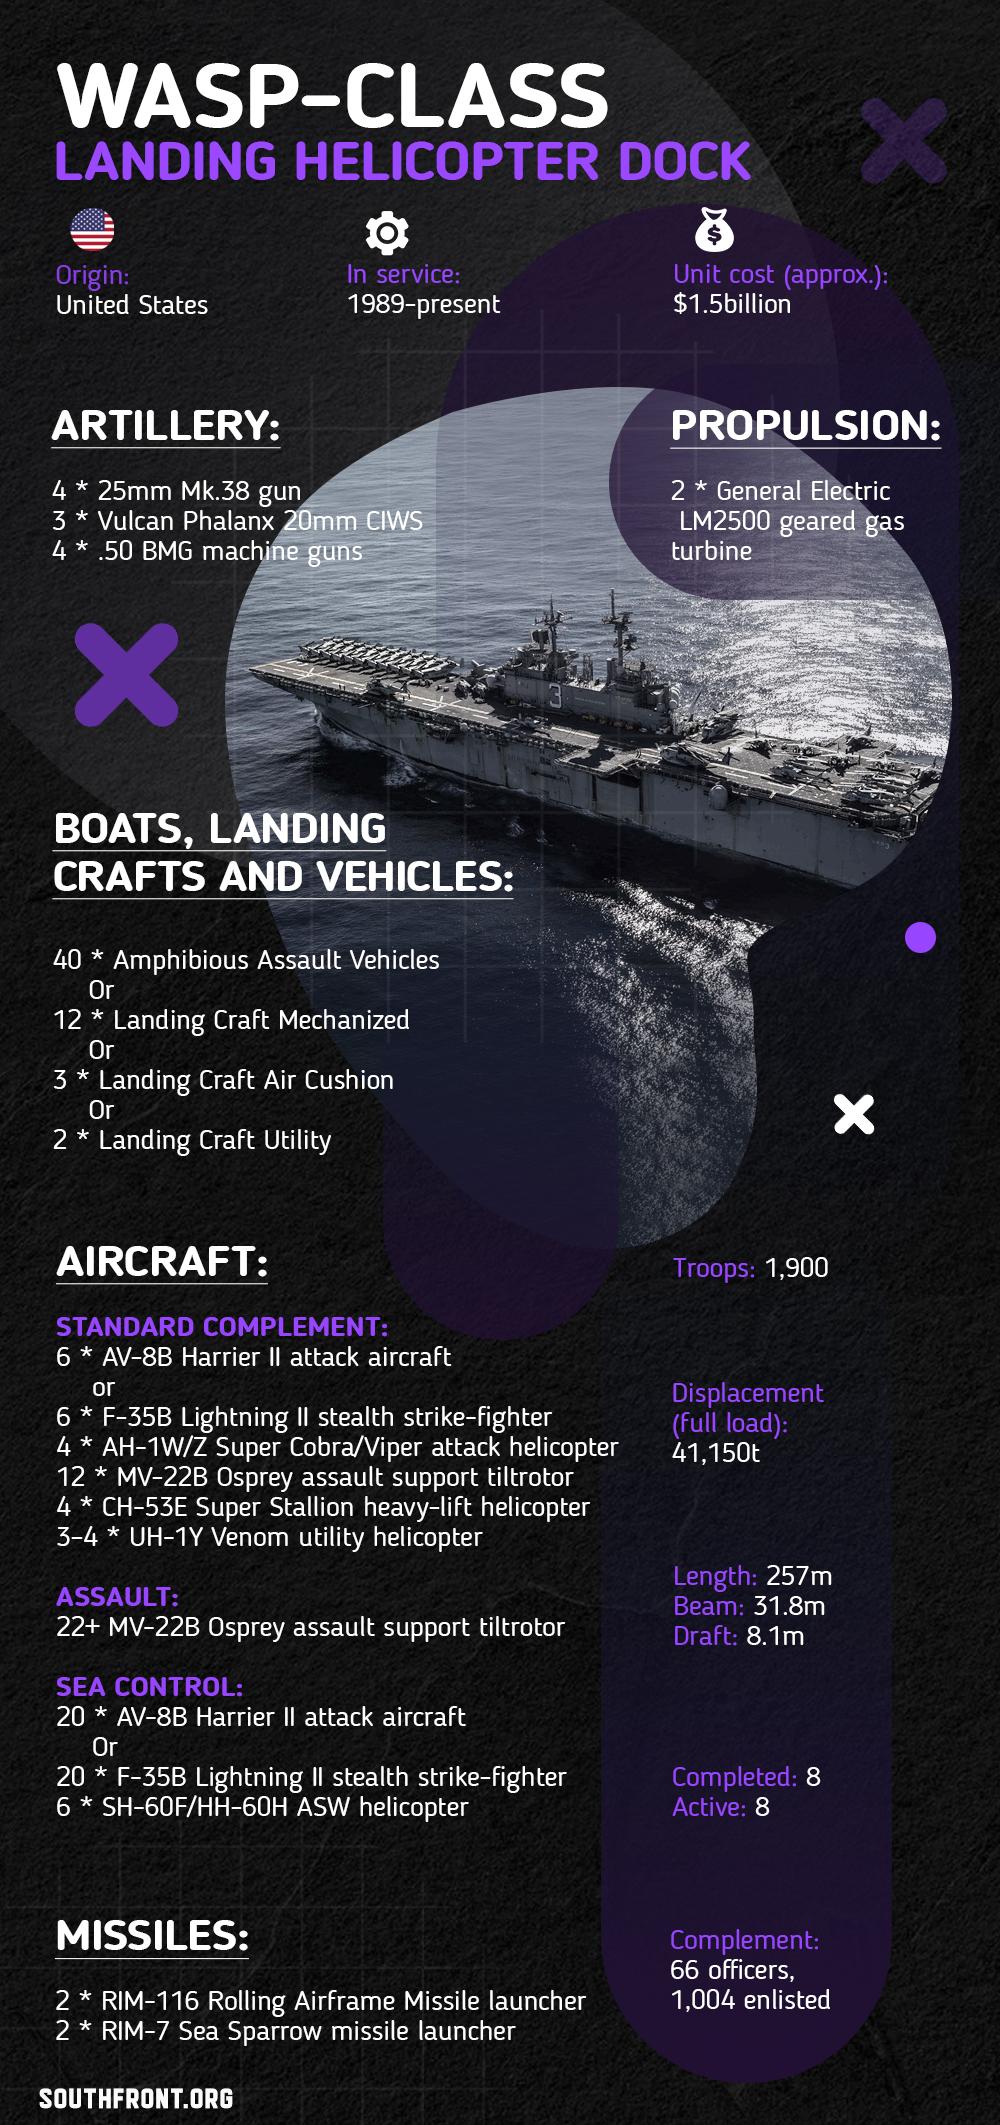 USS Bonhomme Richard Amphibious Assault Ship On Fire At Naval Base San Diego (Videos)